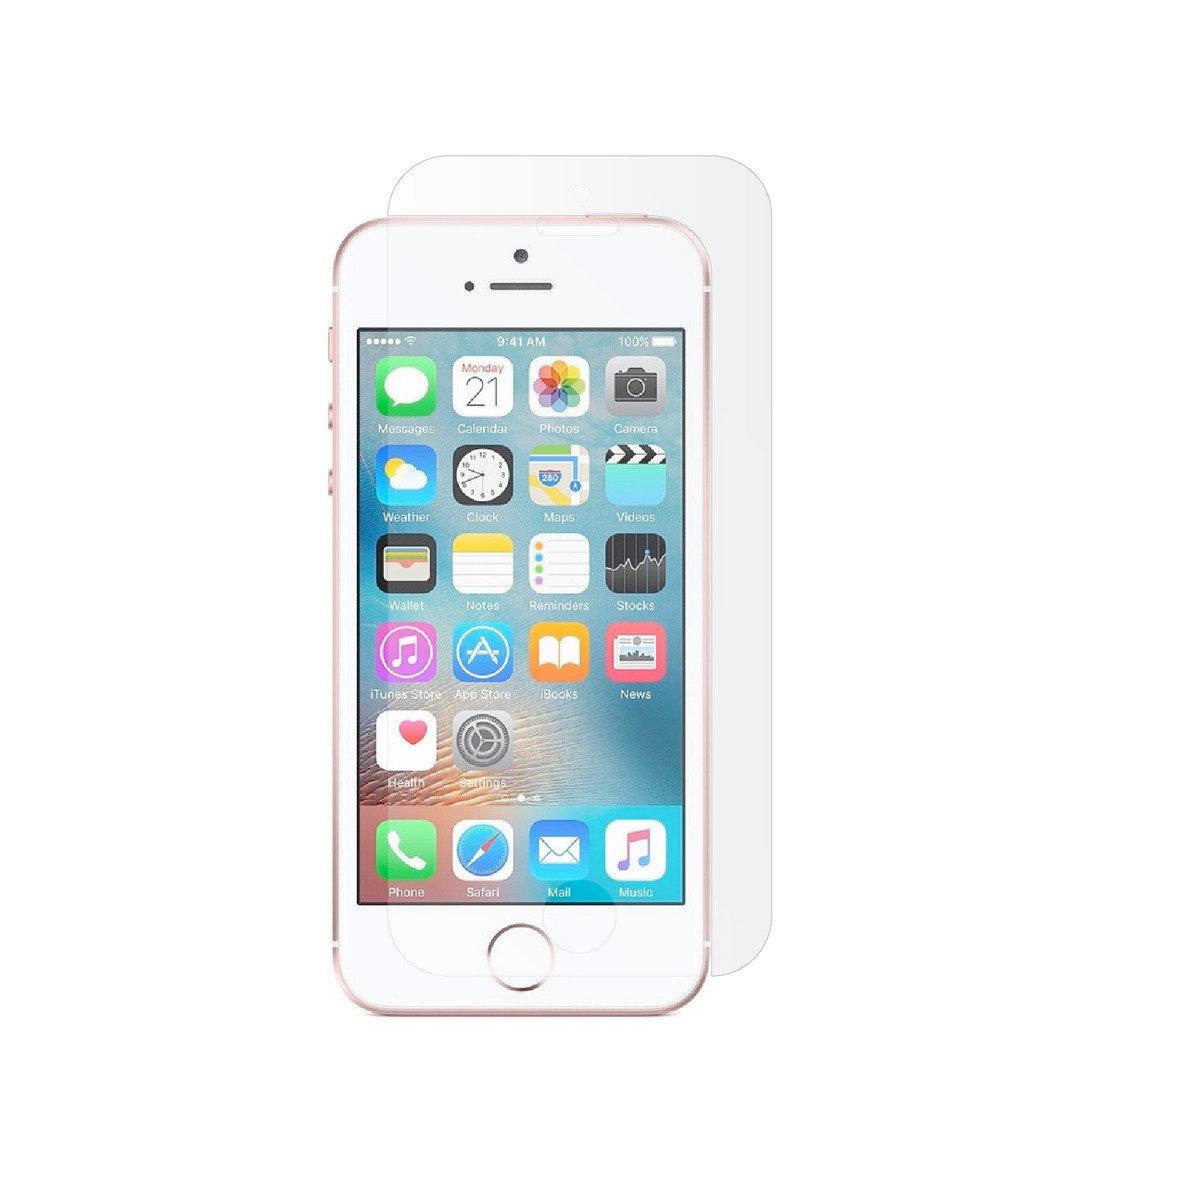 iPhone SE/5/5S/5C 9H 0.33毫米強化玻璃屏幕保護貼, 日本進口材料。